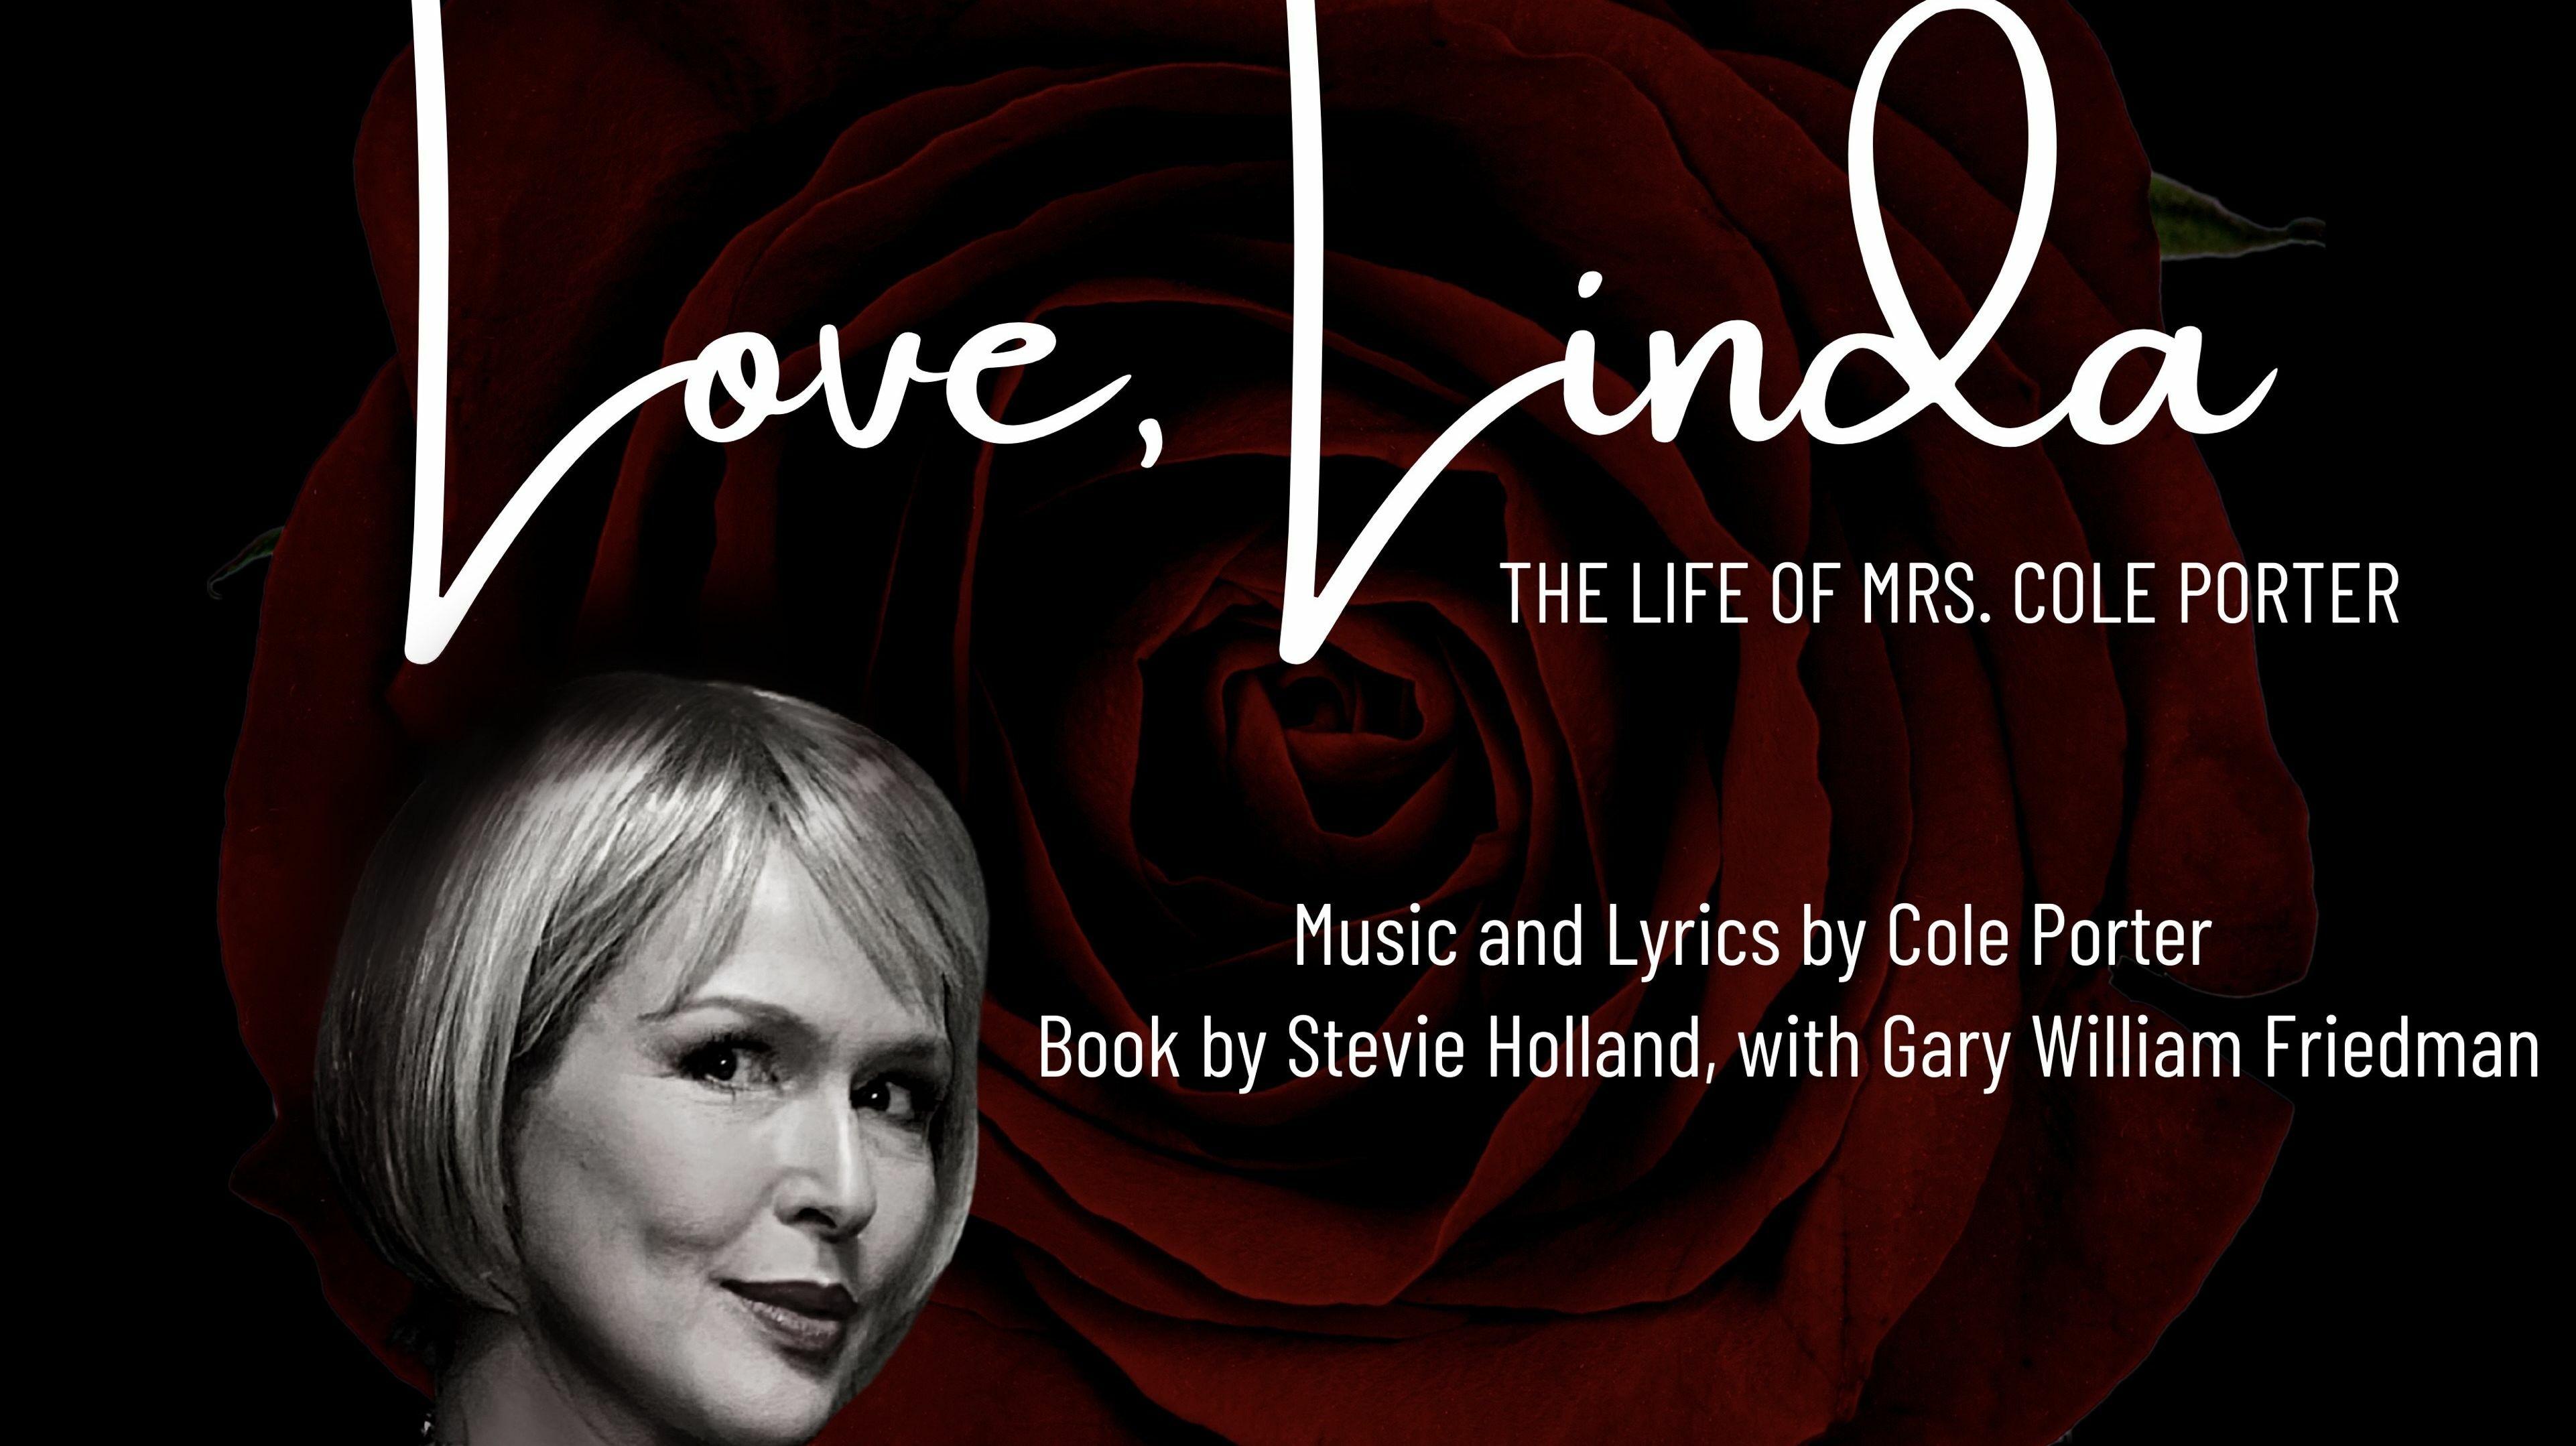 Love, Linda (The Life of Mrs. Cole Porter)